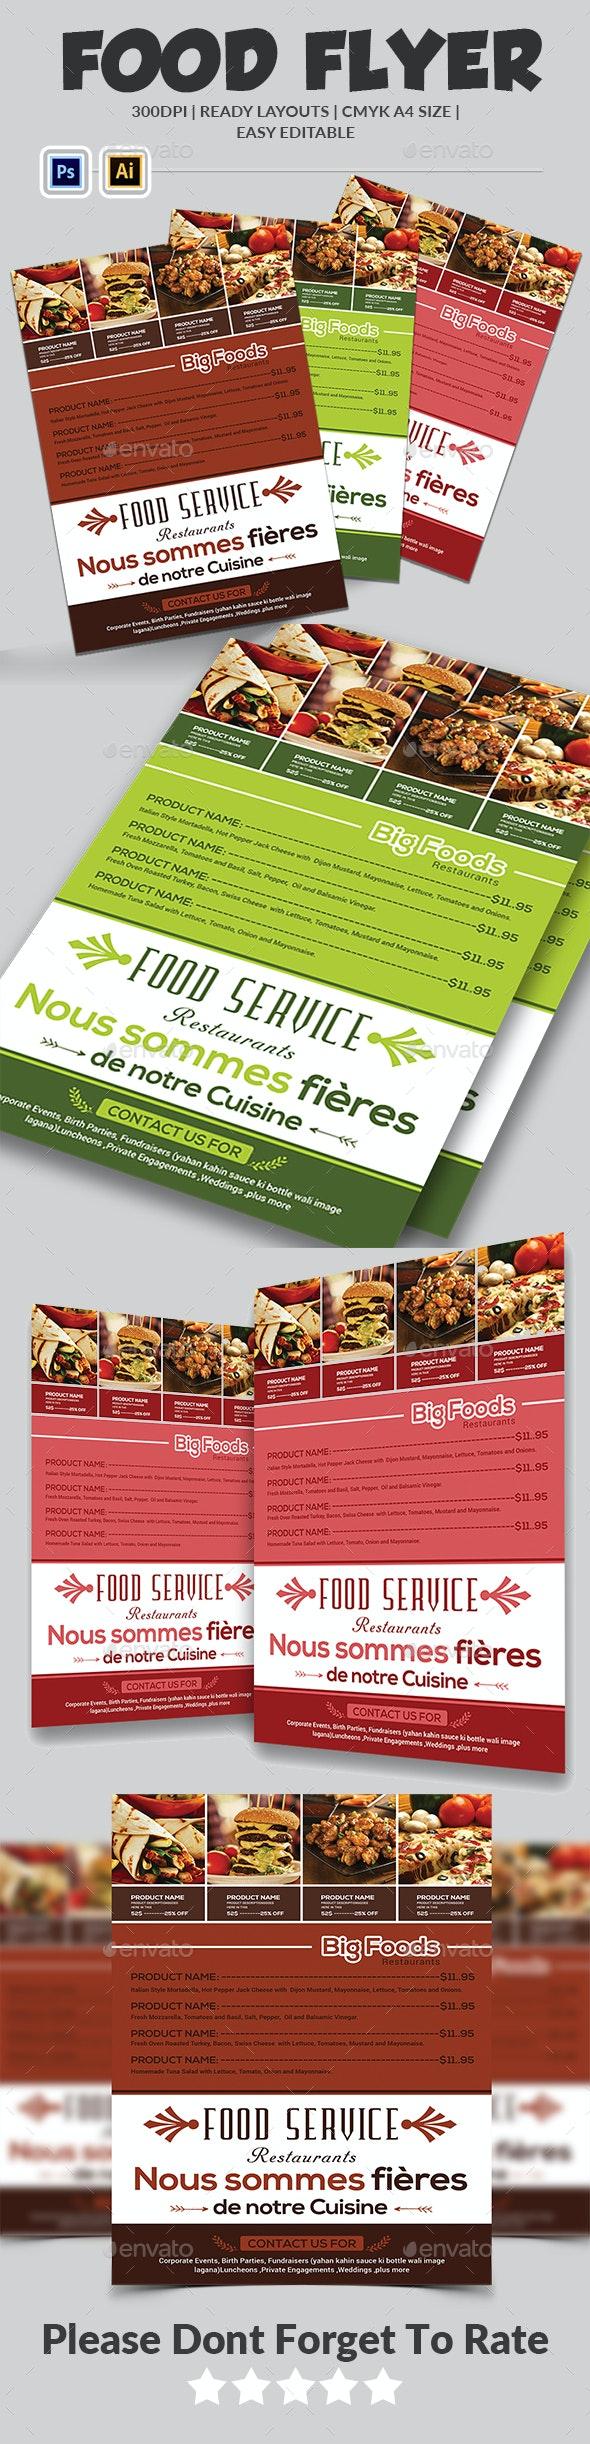 Food Flyer Template - Restaurant Flyers